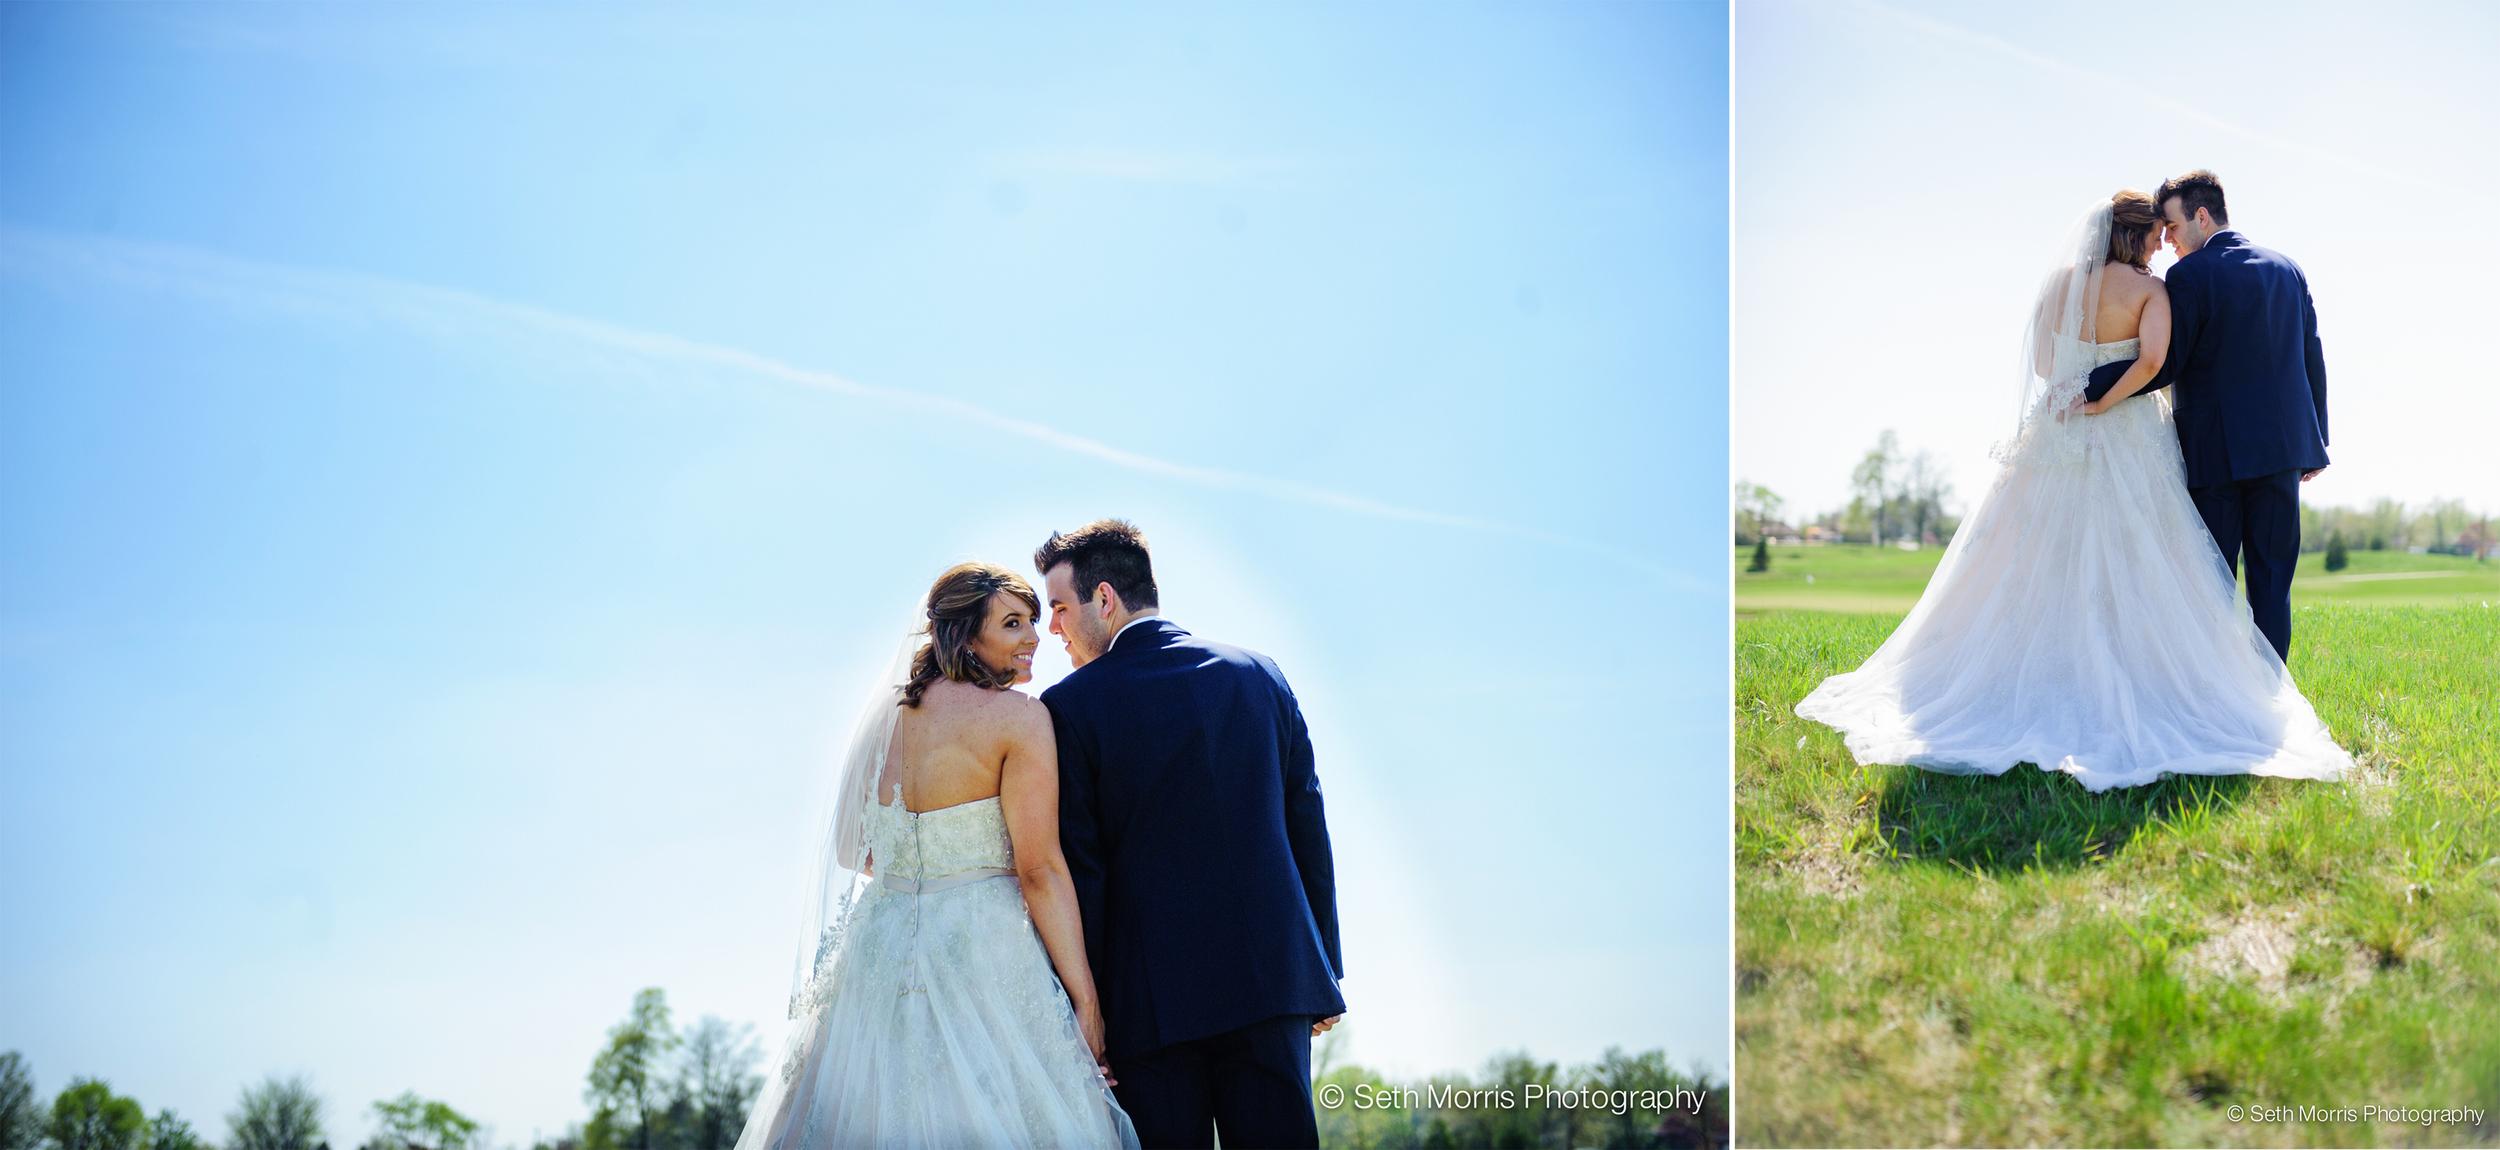 metamora-fields-wedding-photographer-peoria-148.jpg